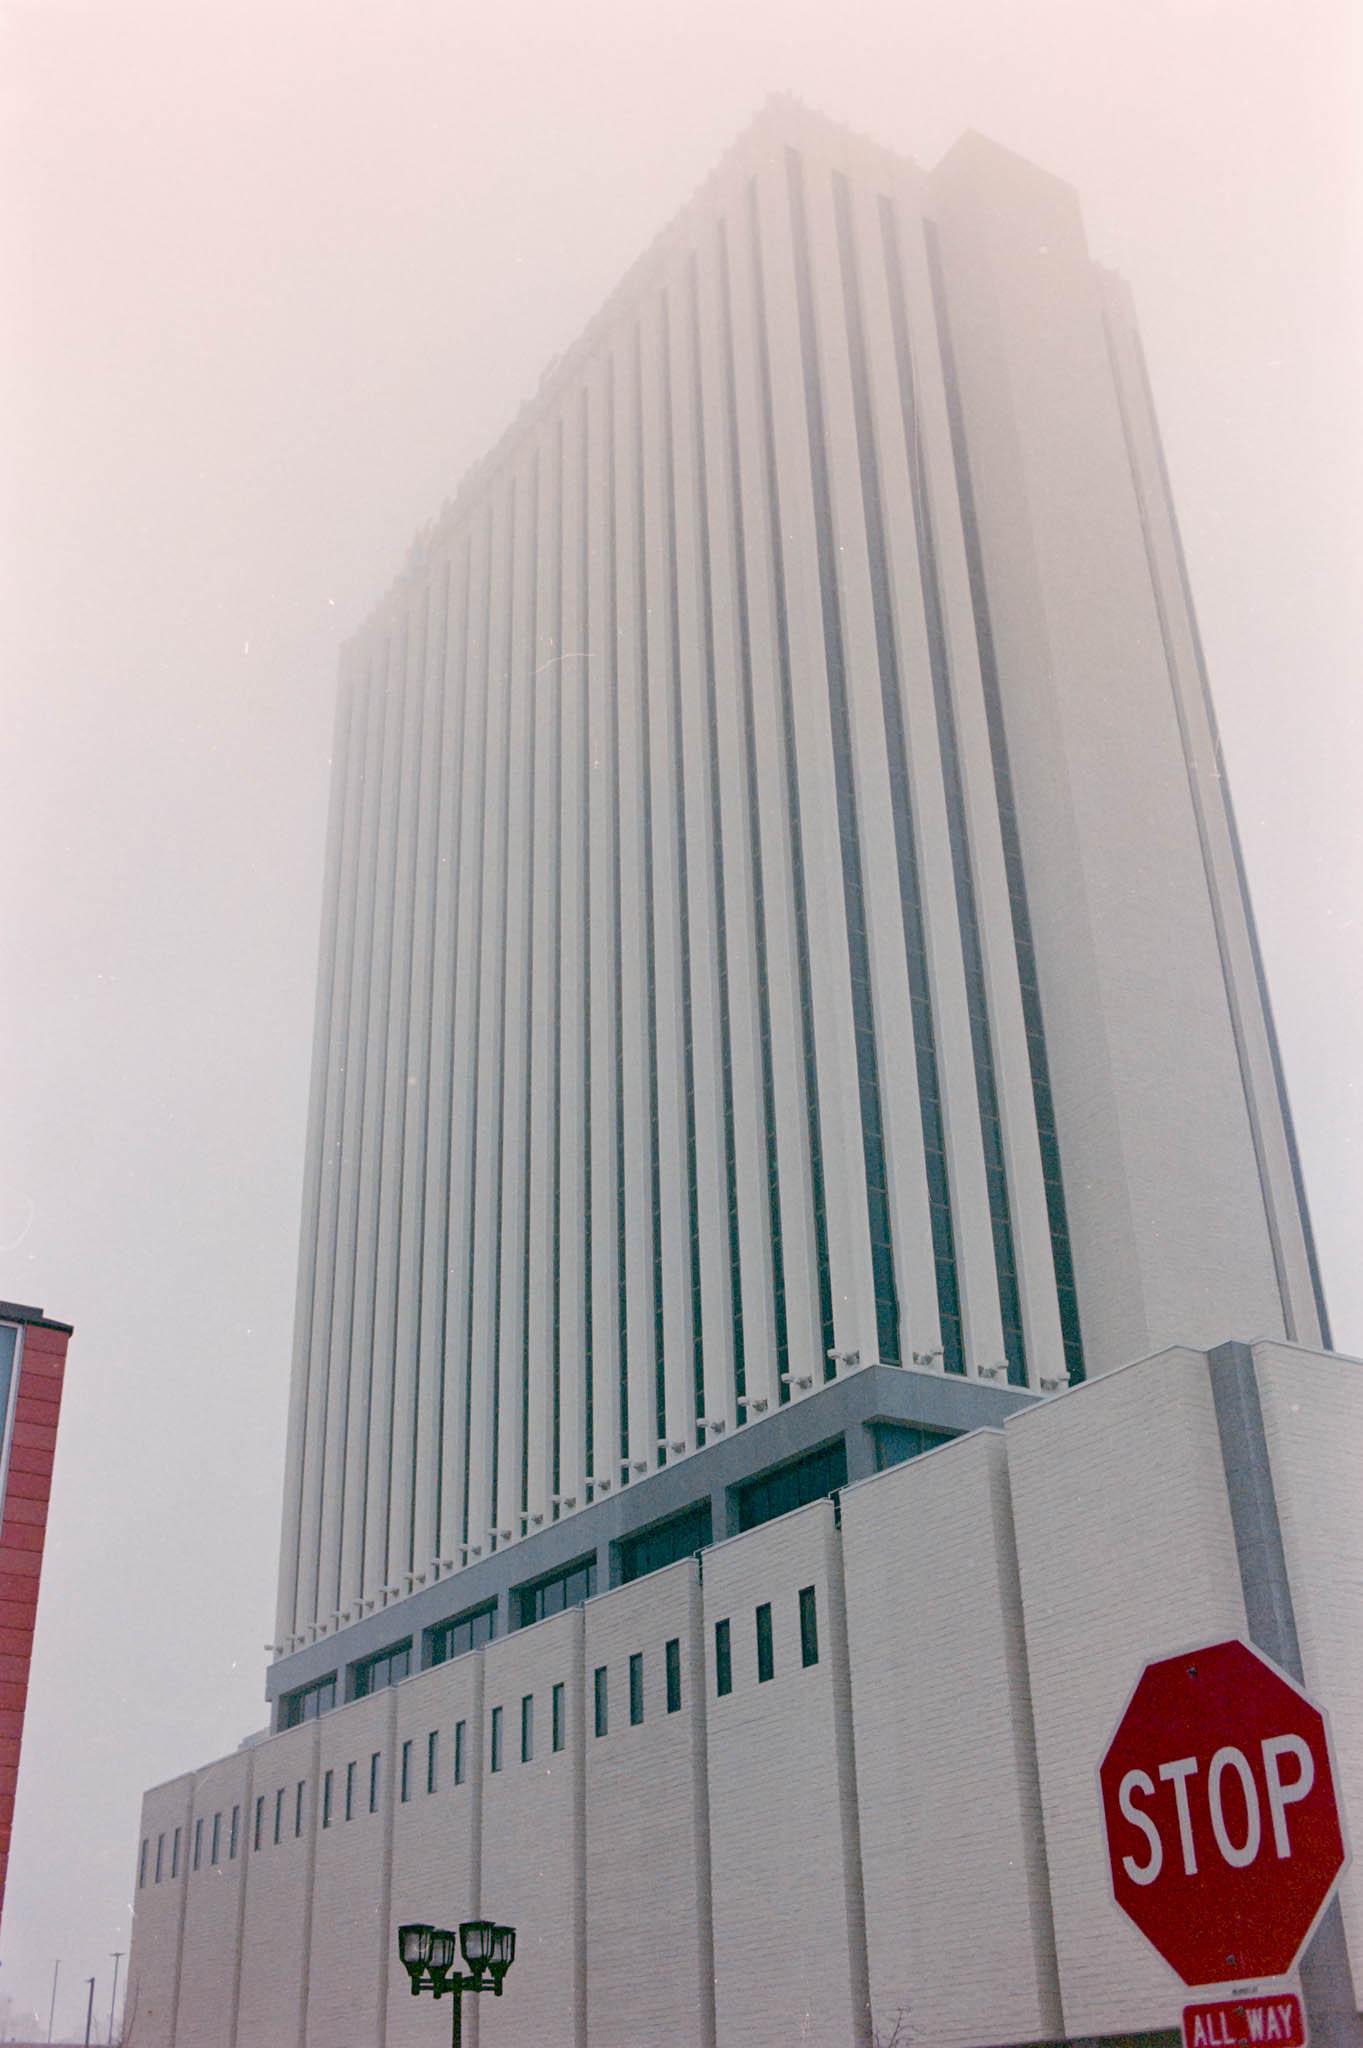 Alliant Energy building, downtown Cedar Rapids on a foggy winter day. Camera: Nikon N2020 with Fujifilm Superia 400